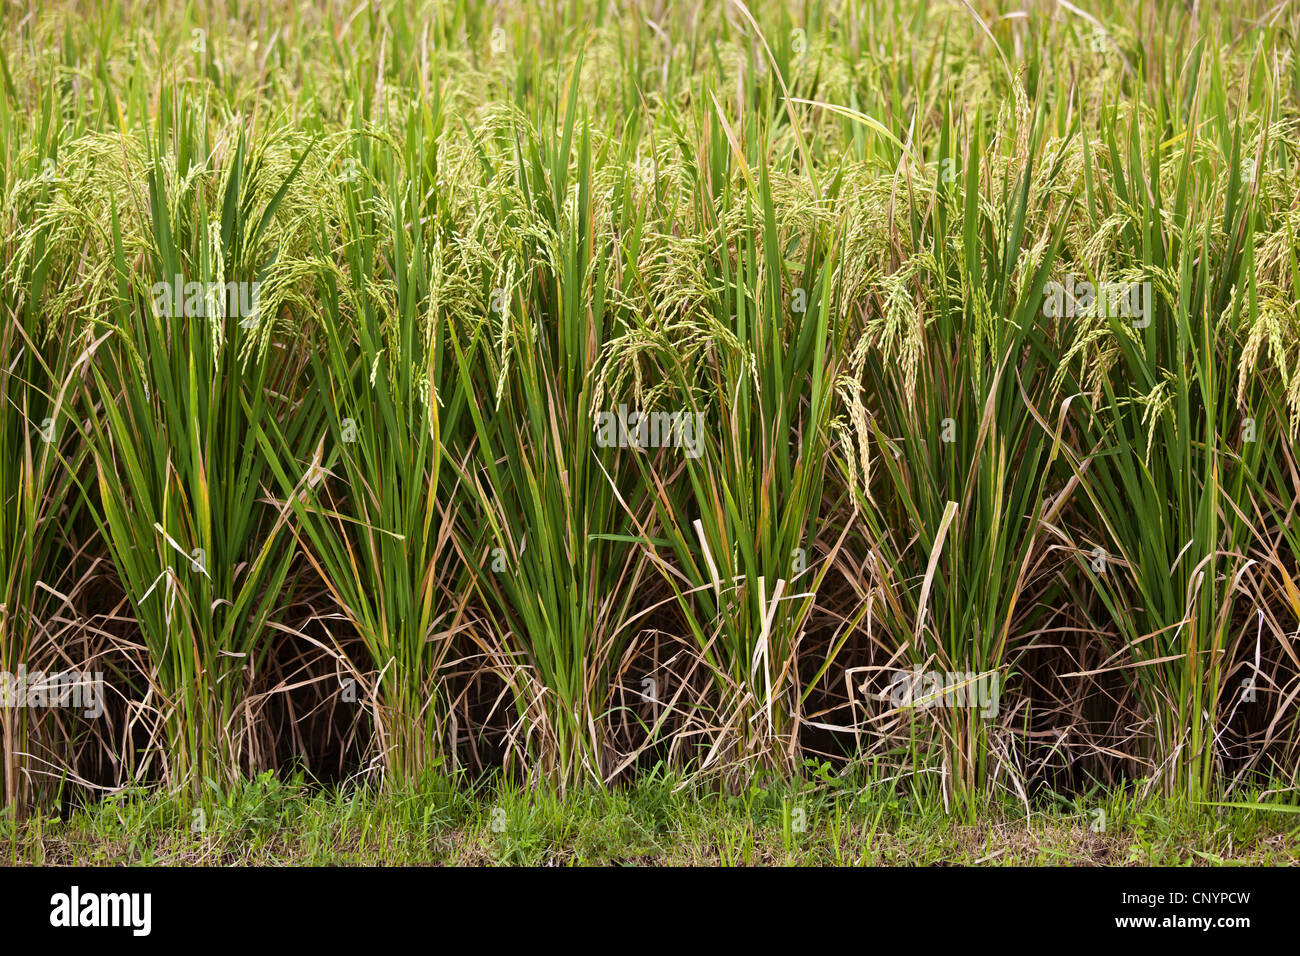 common rice (Oryza sativa), rice field, Indonesia, Bali Stock Photo